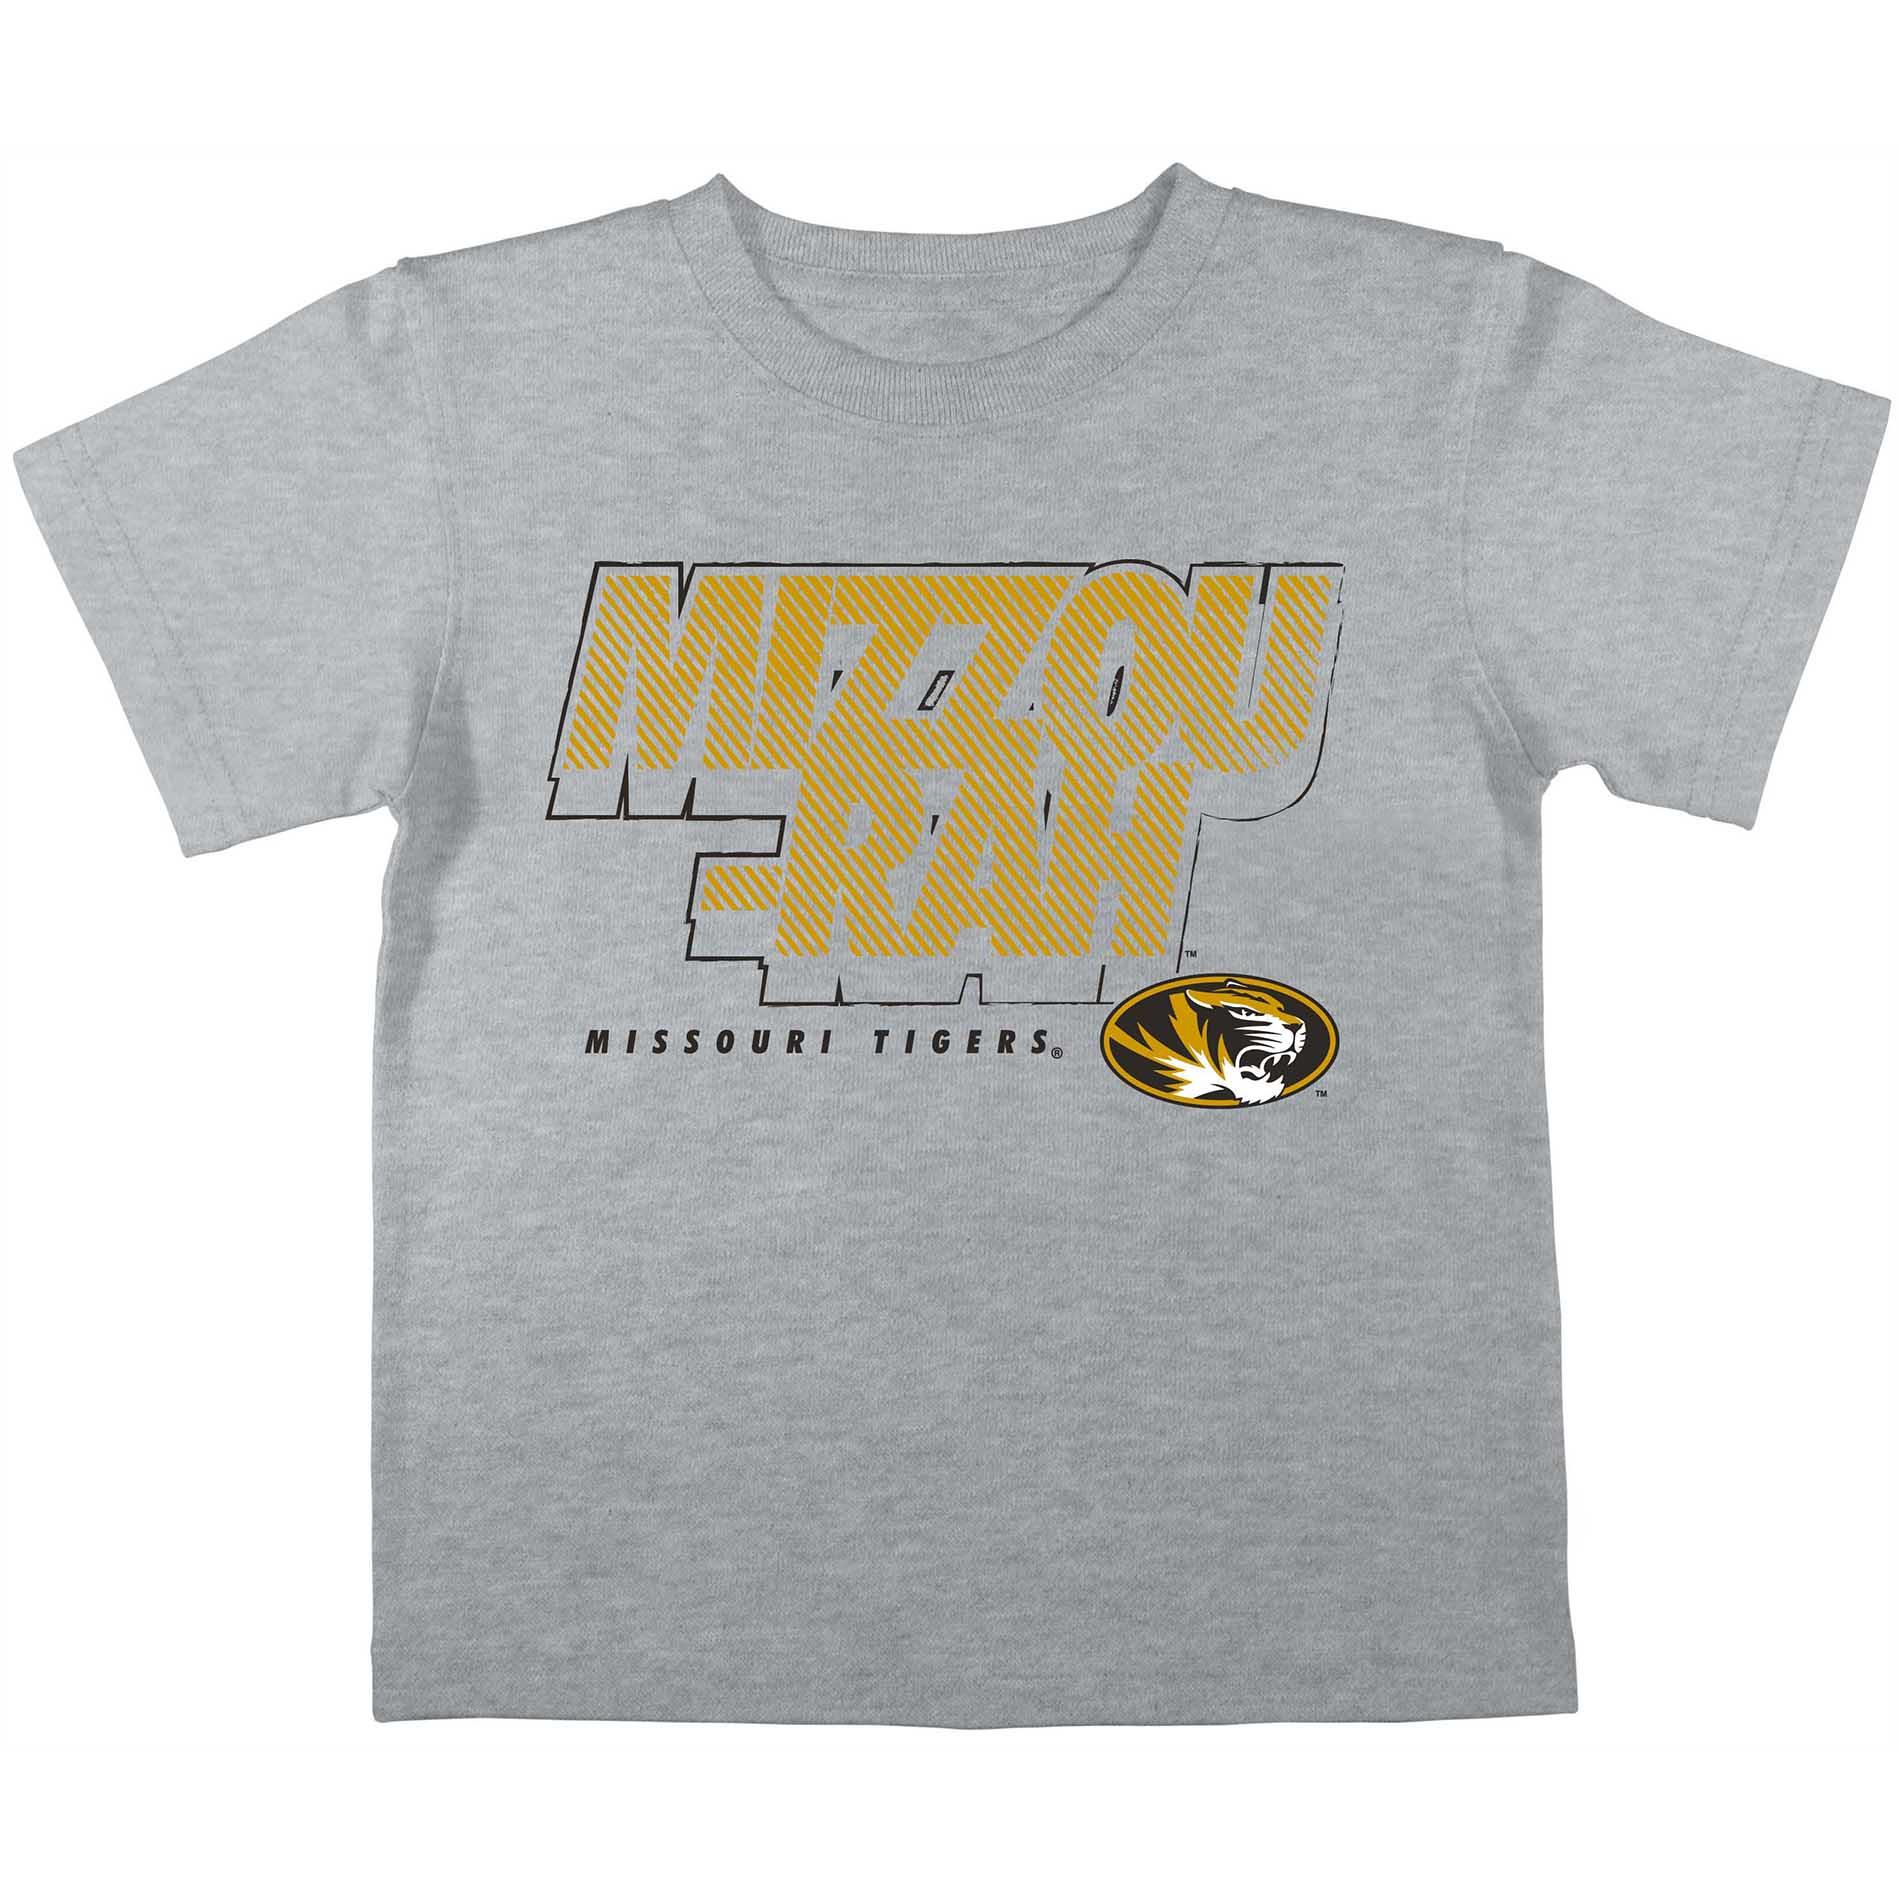 NCAA Youth University of Missouri Tigers Short Sleeve Tee